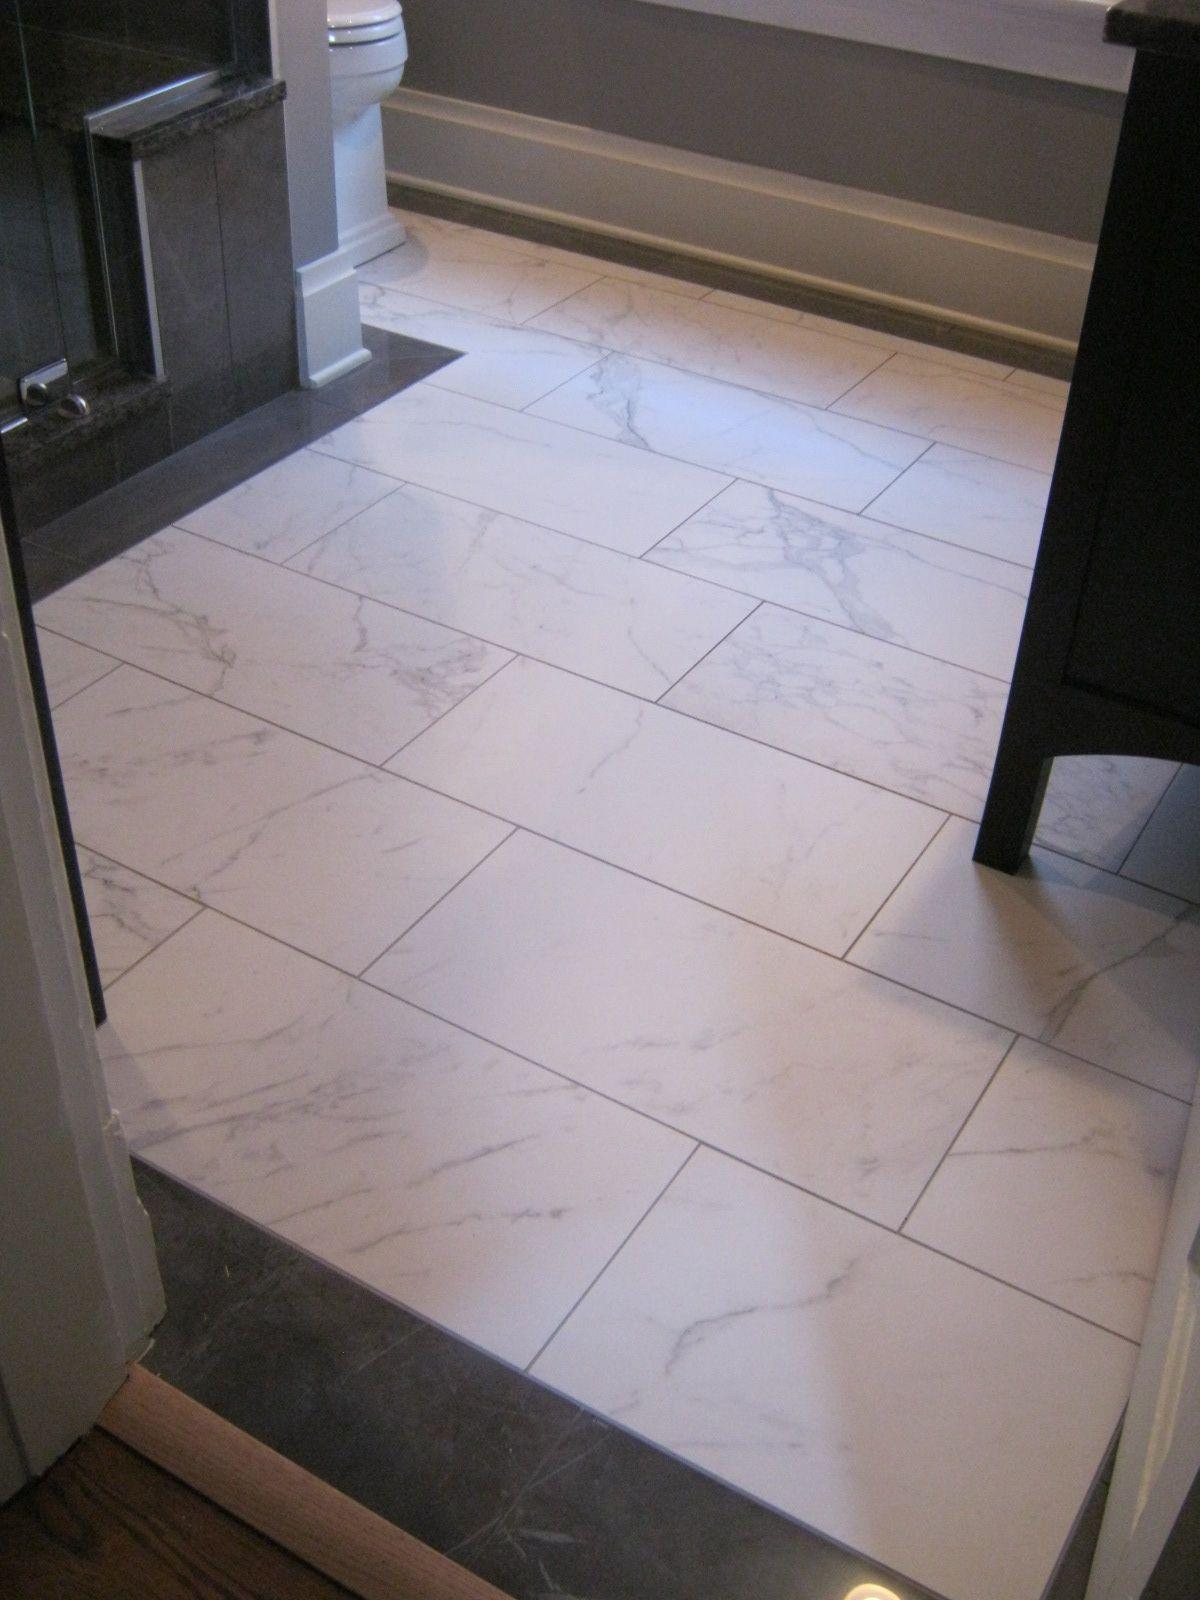 Atlas Marvel Floor Tile Detail Of German Village Bathroom Remodel In Columbus Ohio Designed By Monica Miller Ckd Cbd Cr J S Brown Co